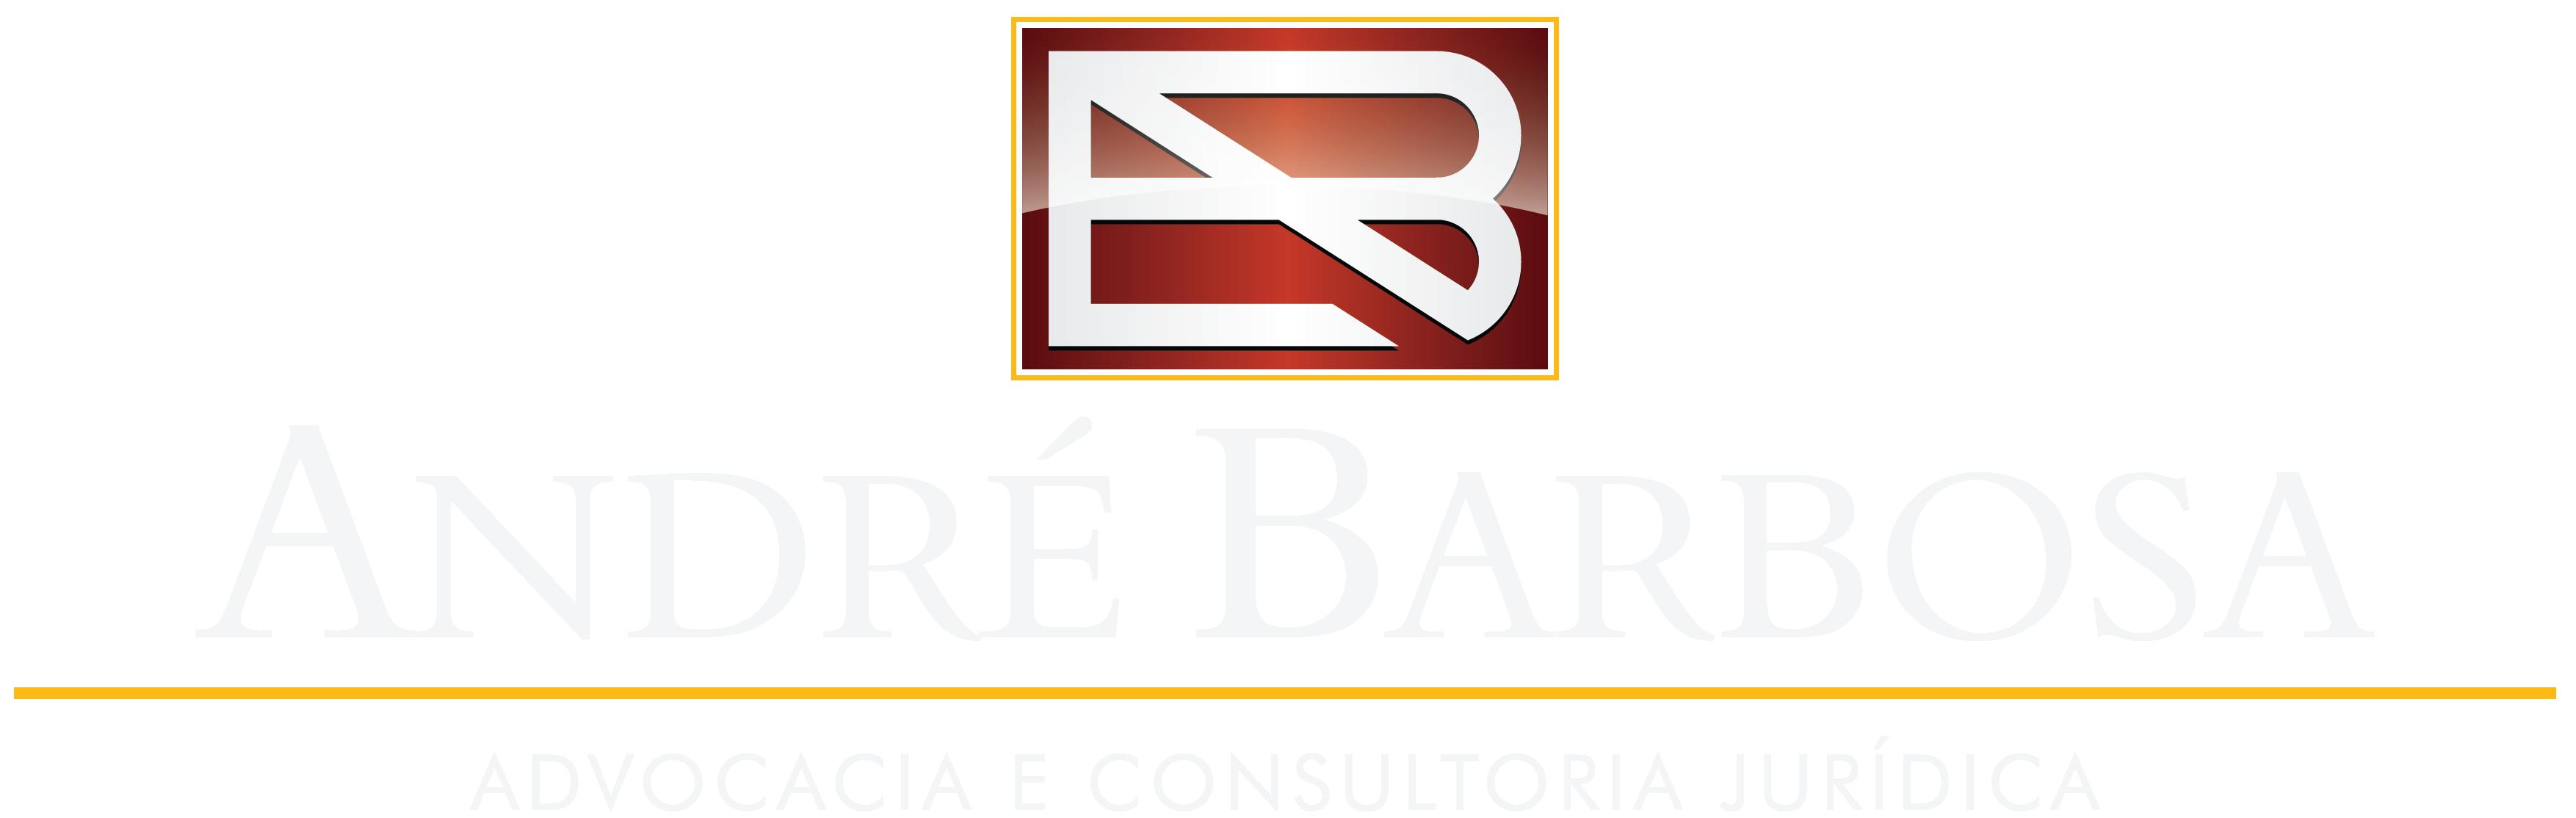 André Barbosa |  Advocacia e consultoria jurídica